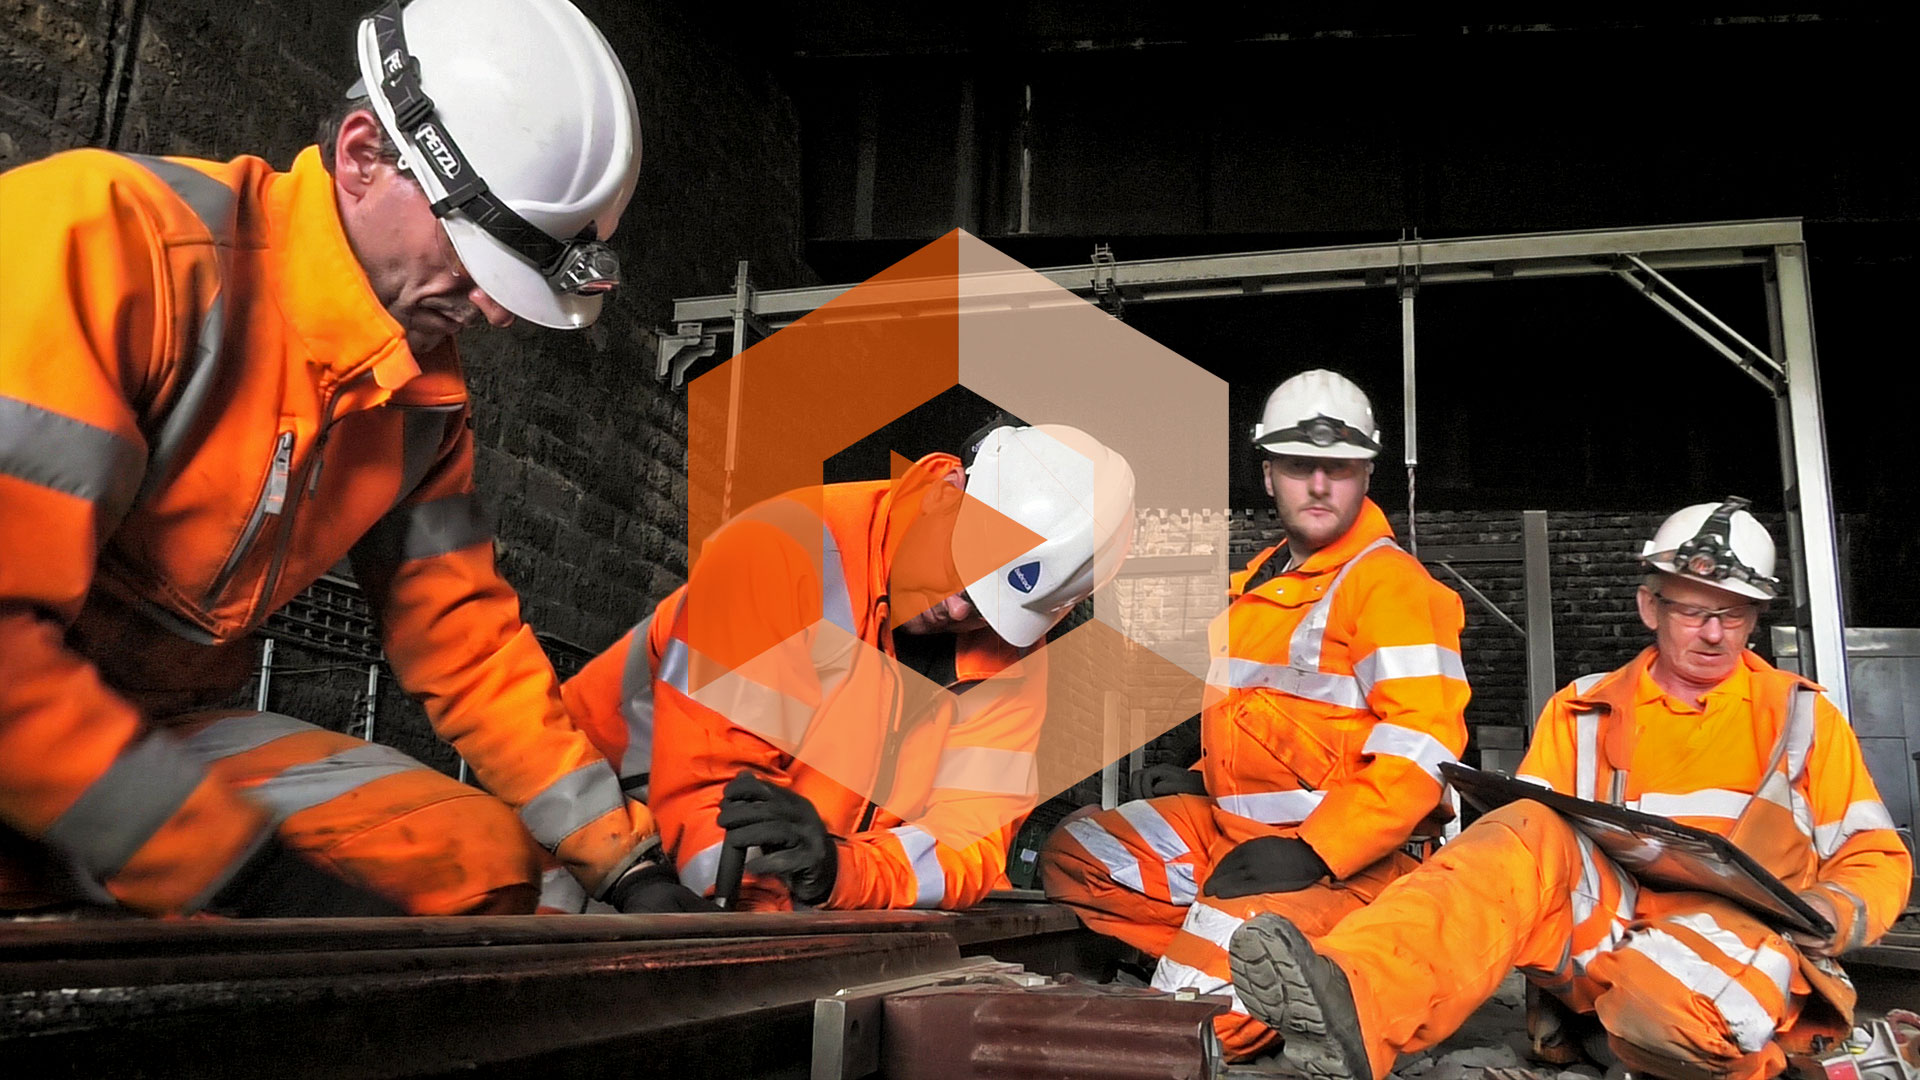 Video Glasgow Queen Street Rail Engineer